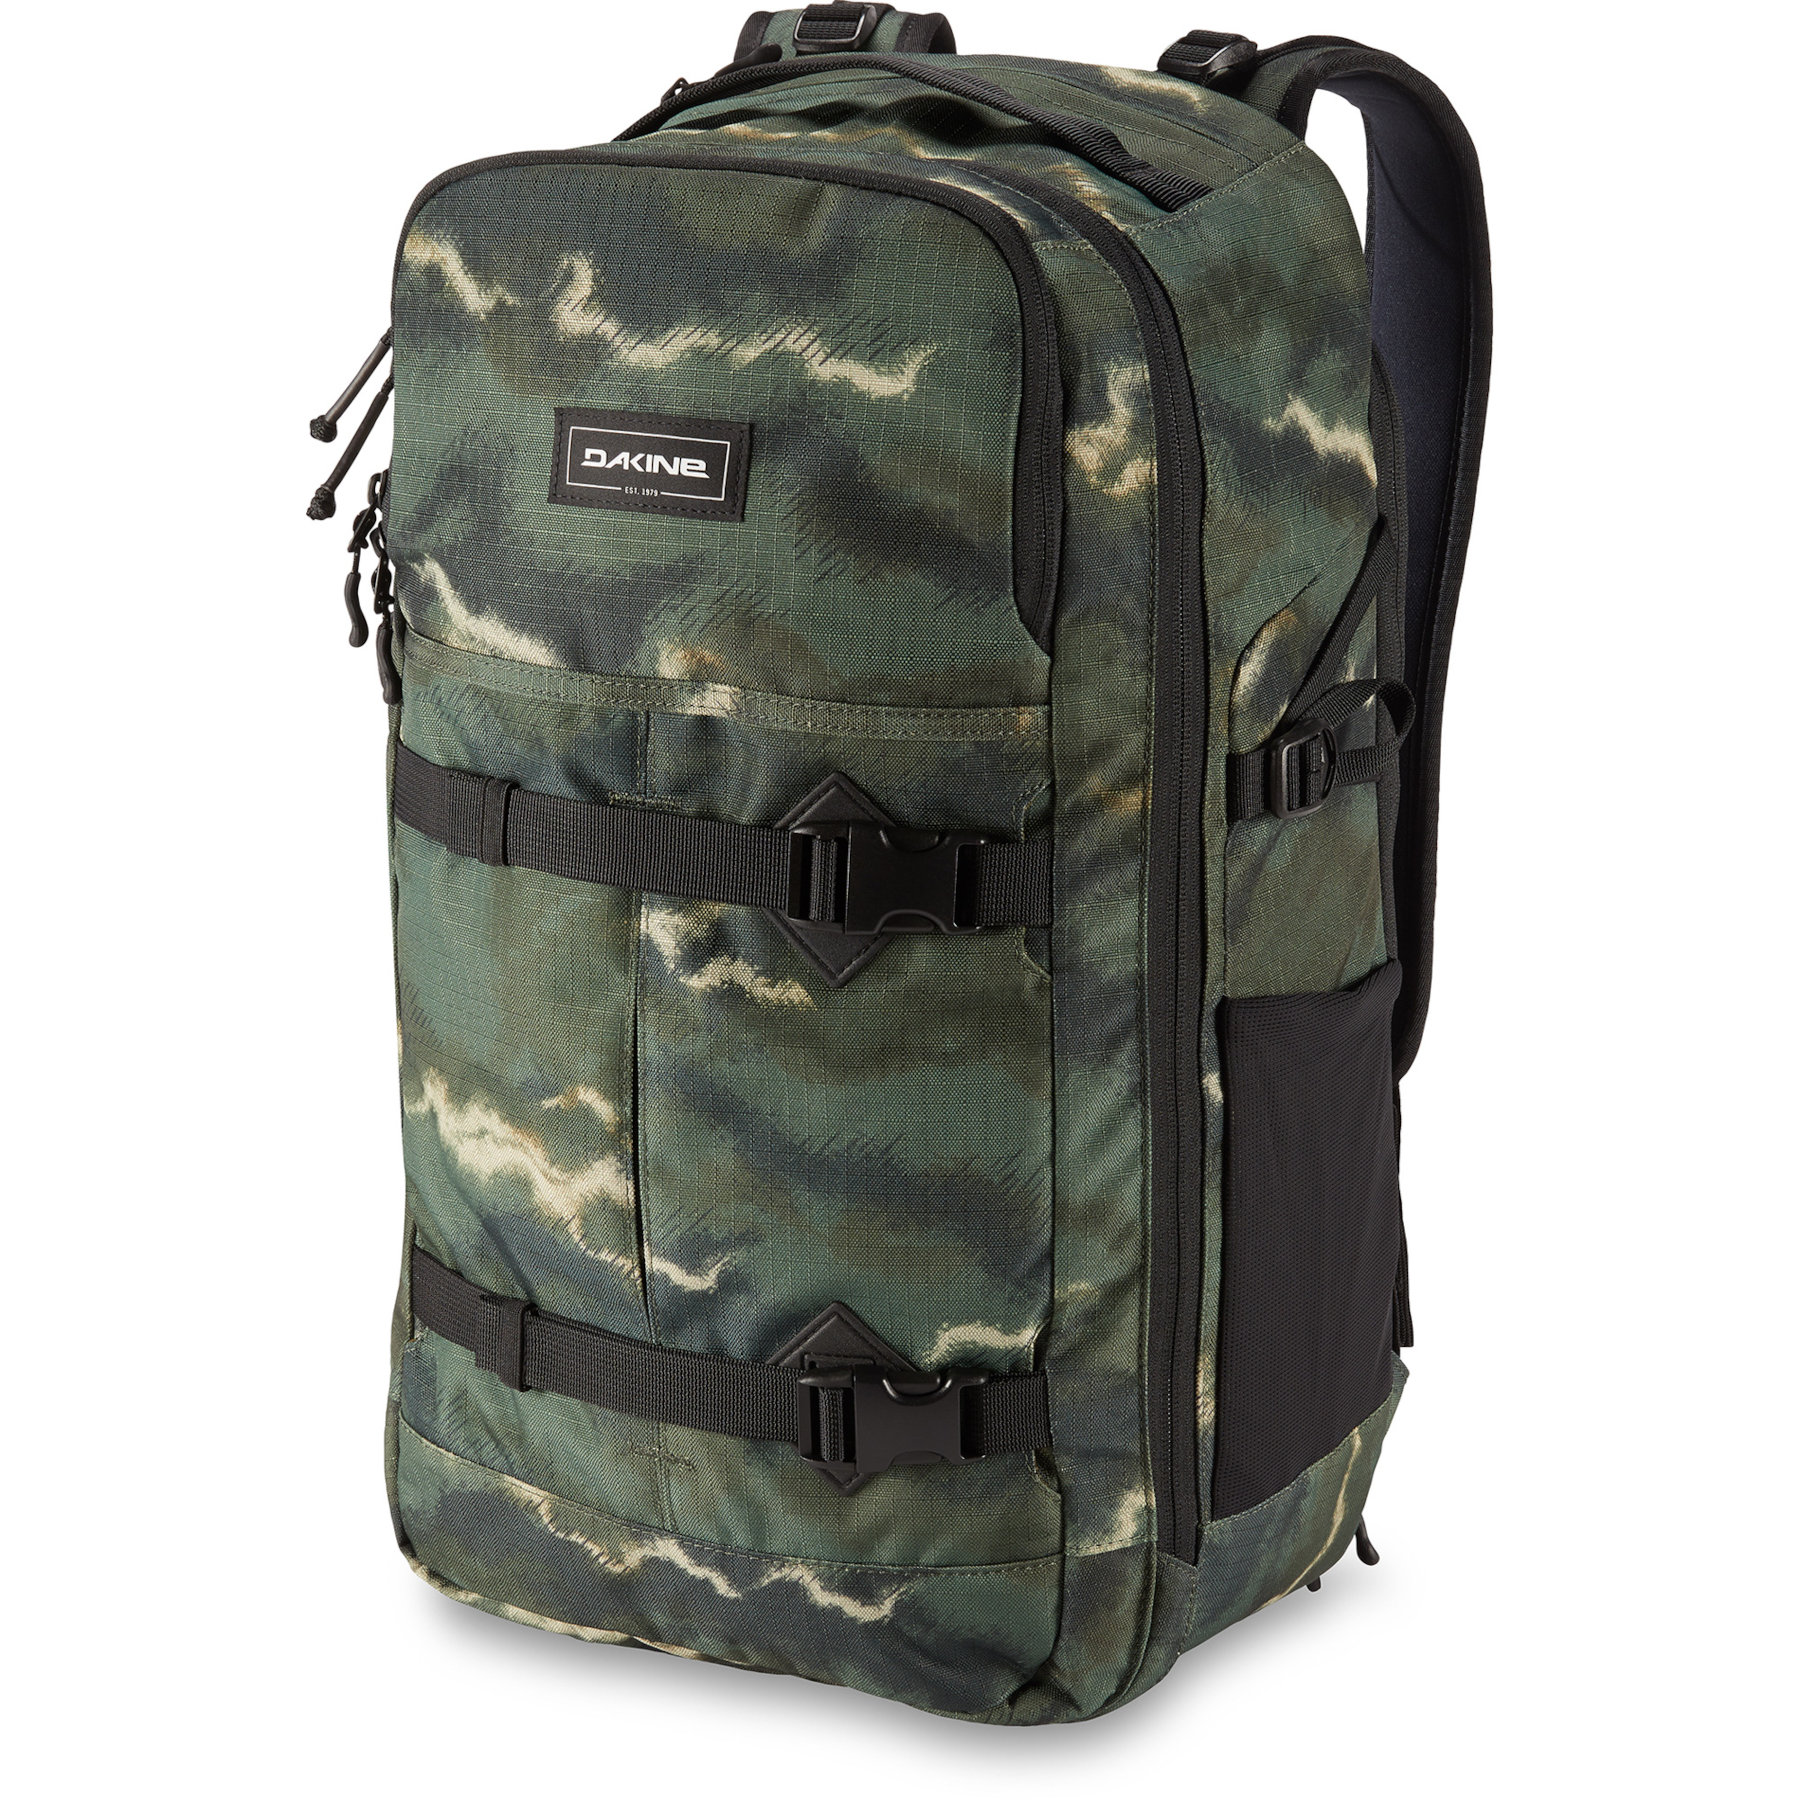 Dakine Split Adventure 38L Backpack 10001254 - Olive Ashcroft Camo